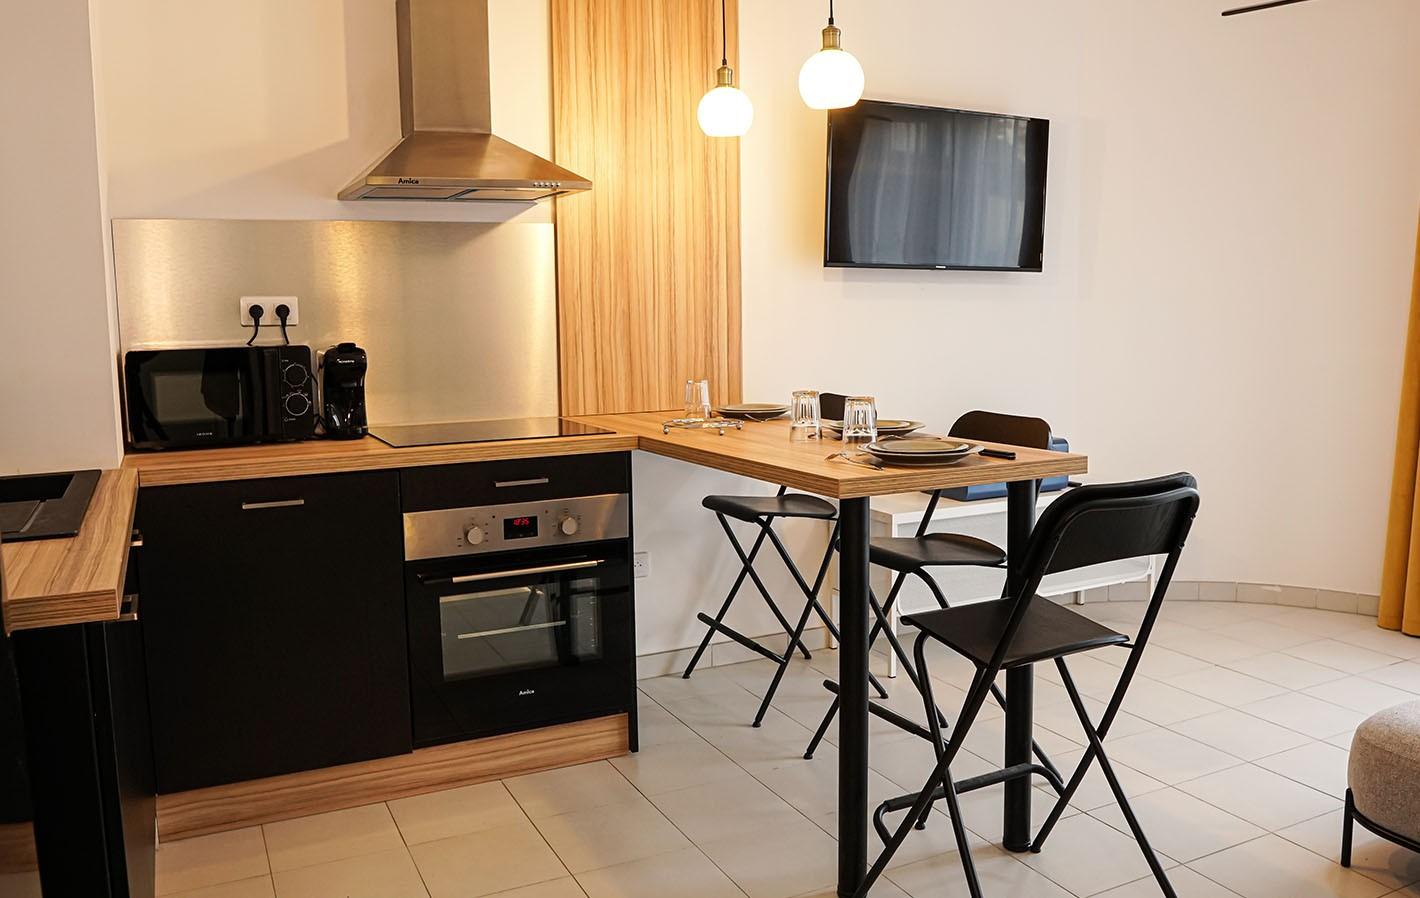 image  2021 03 08 residence etudiante suitetudes streamline boulogne billancourt t3 experience cuisine